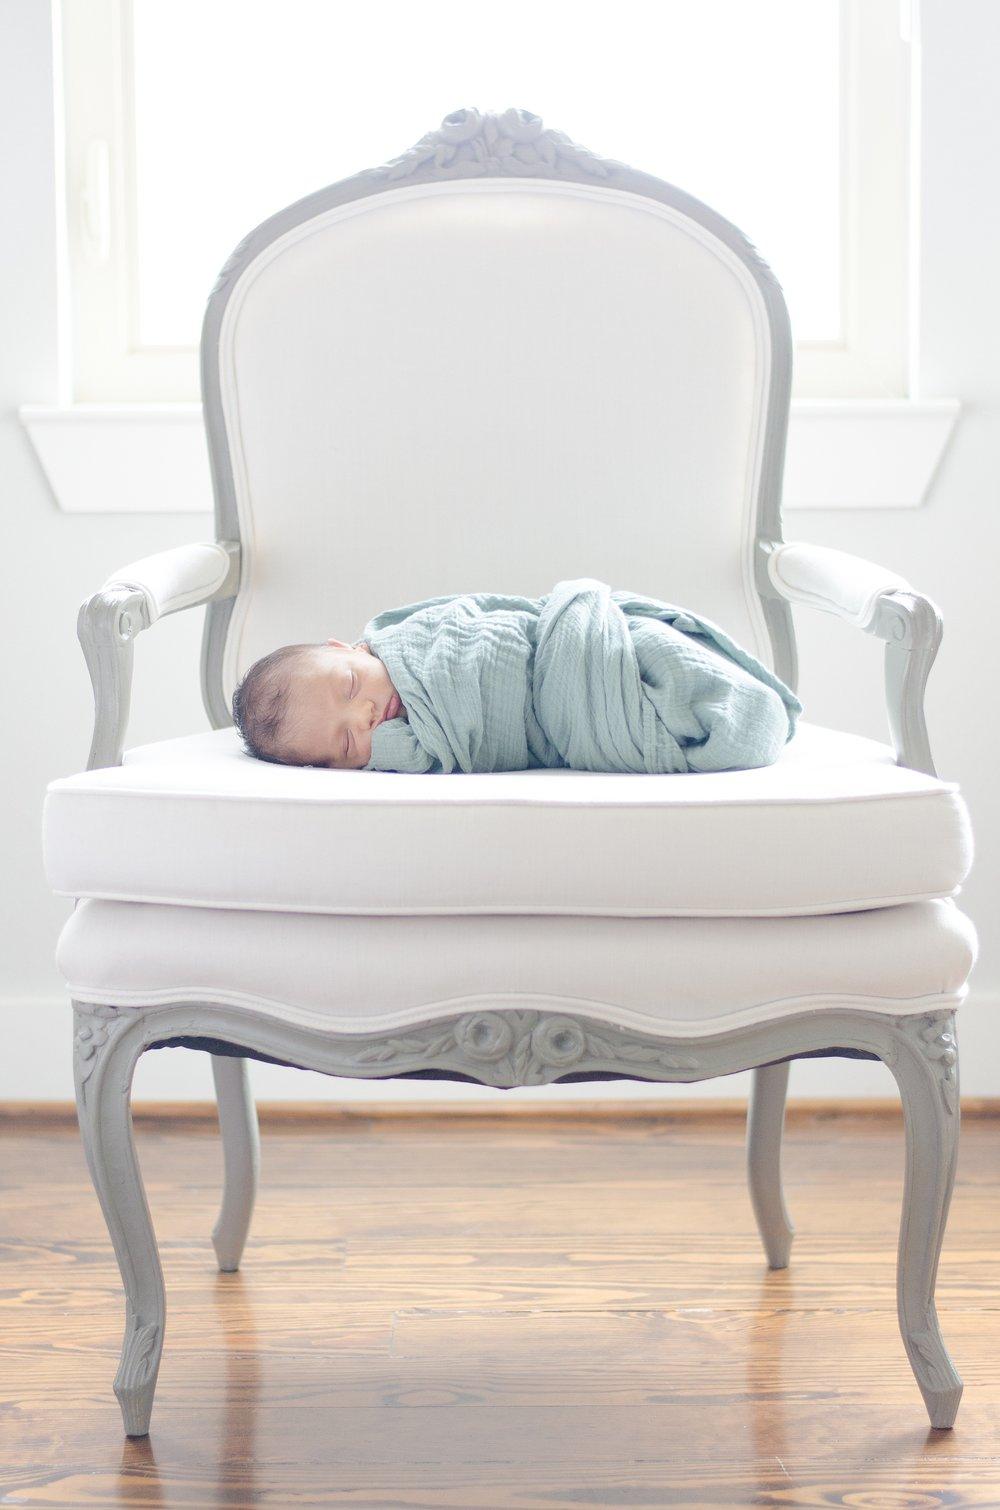 Landon-Schneider-Photography-Newborn-Session-Houston-Texas_0149.jpg